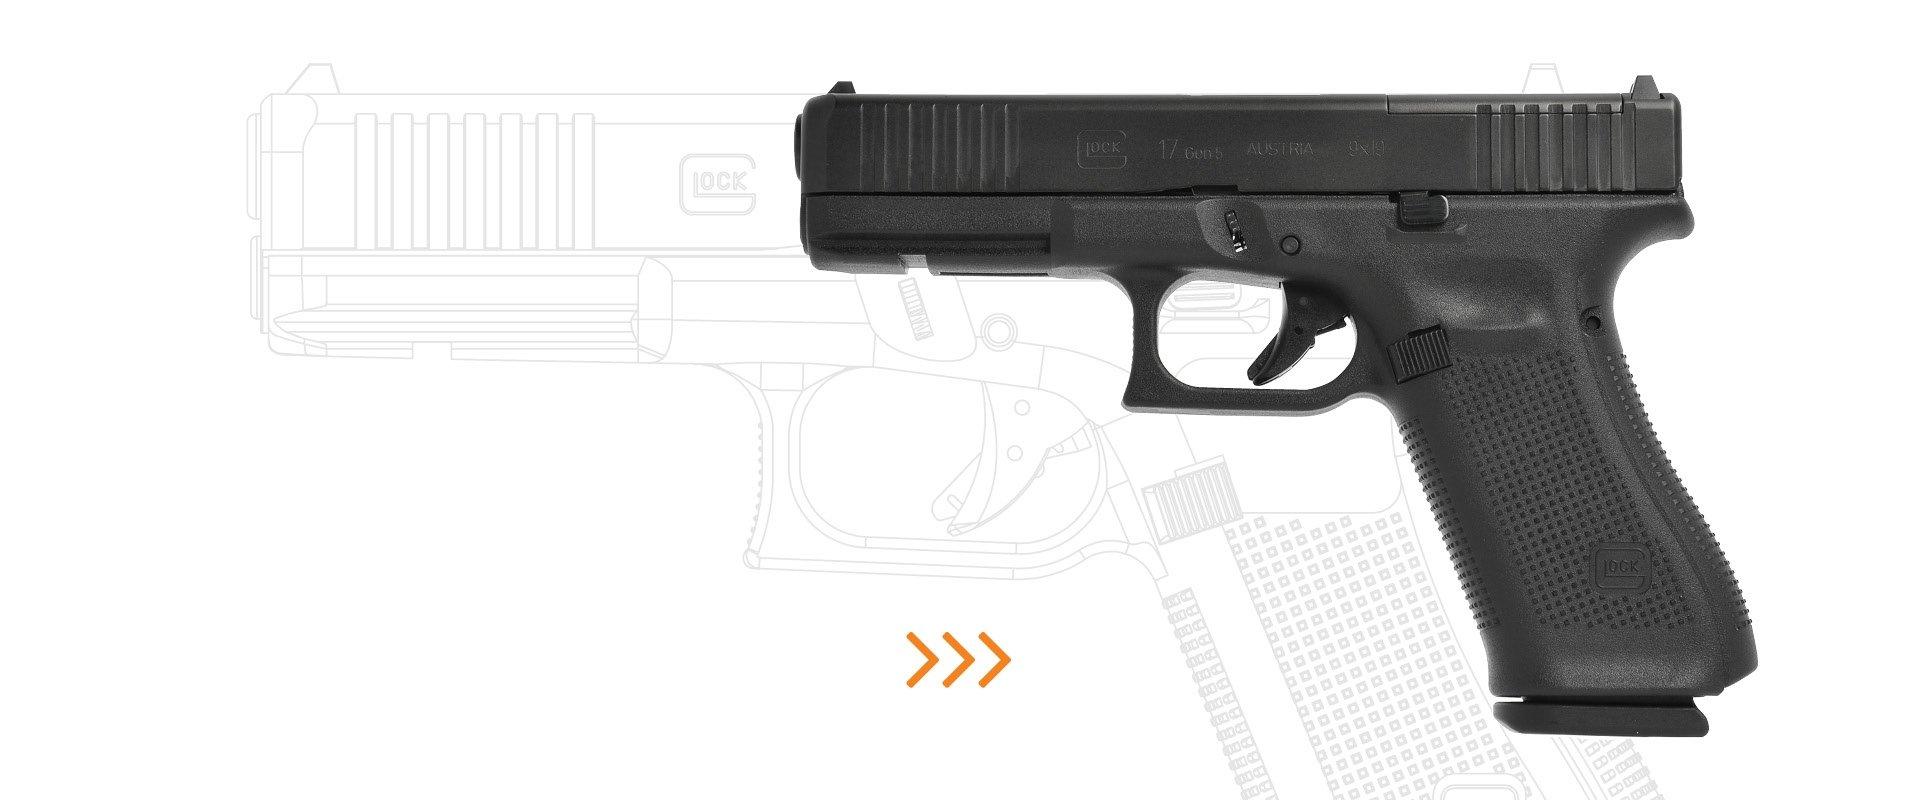 Gen5 Glock 17 MOS